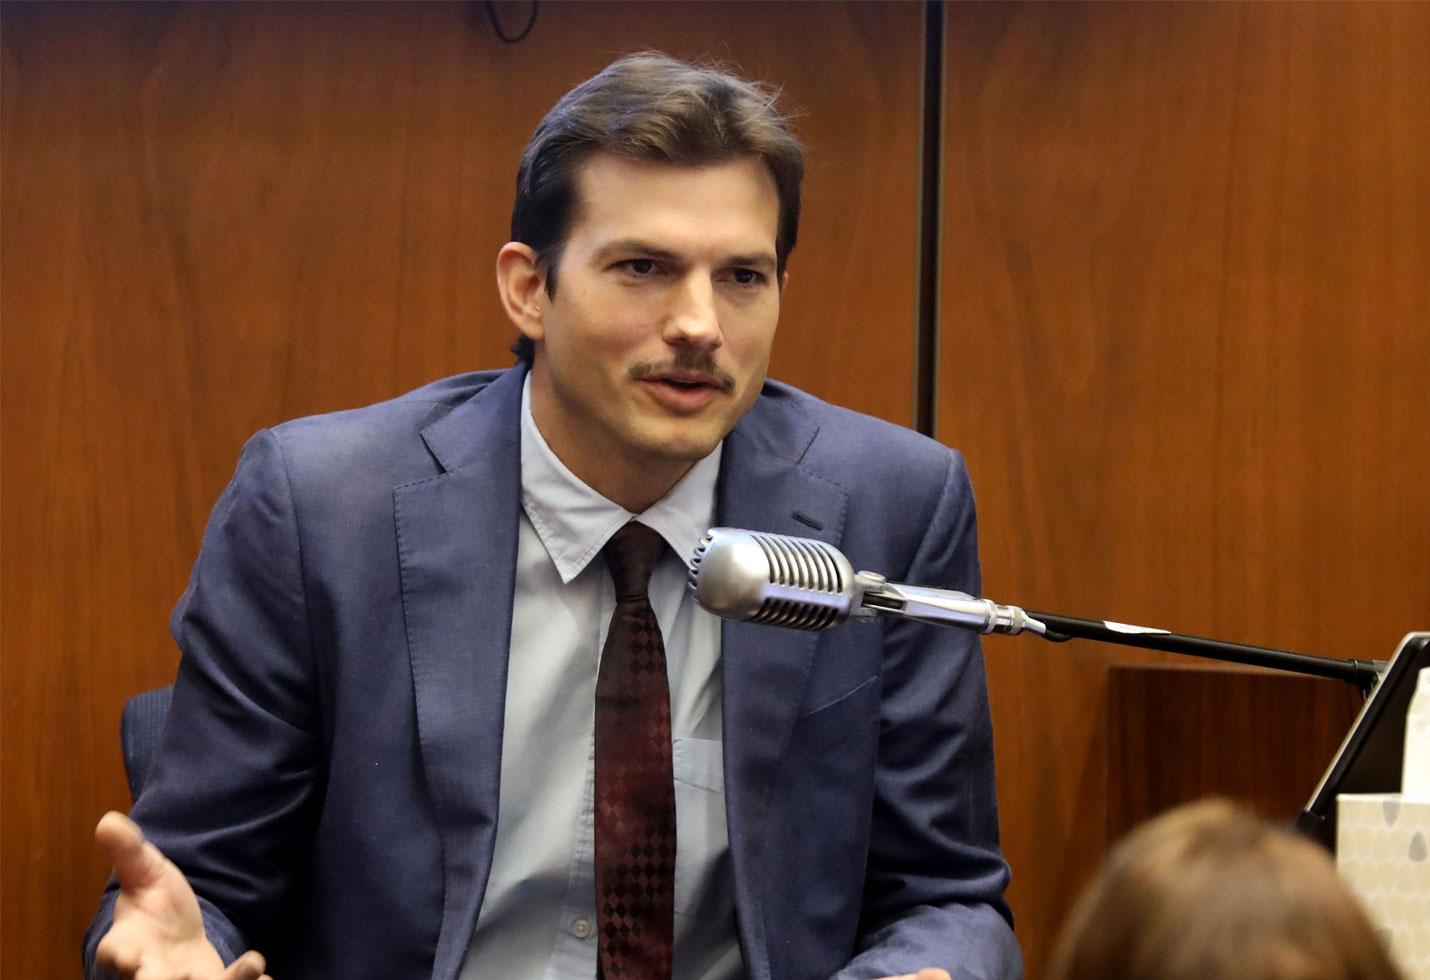 Ashton kutcher testifies hollywood ripper ashley ellerin murder photos